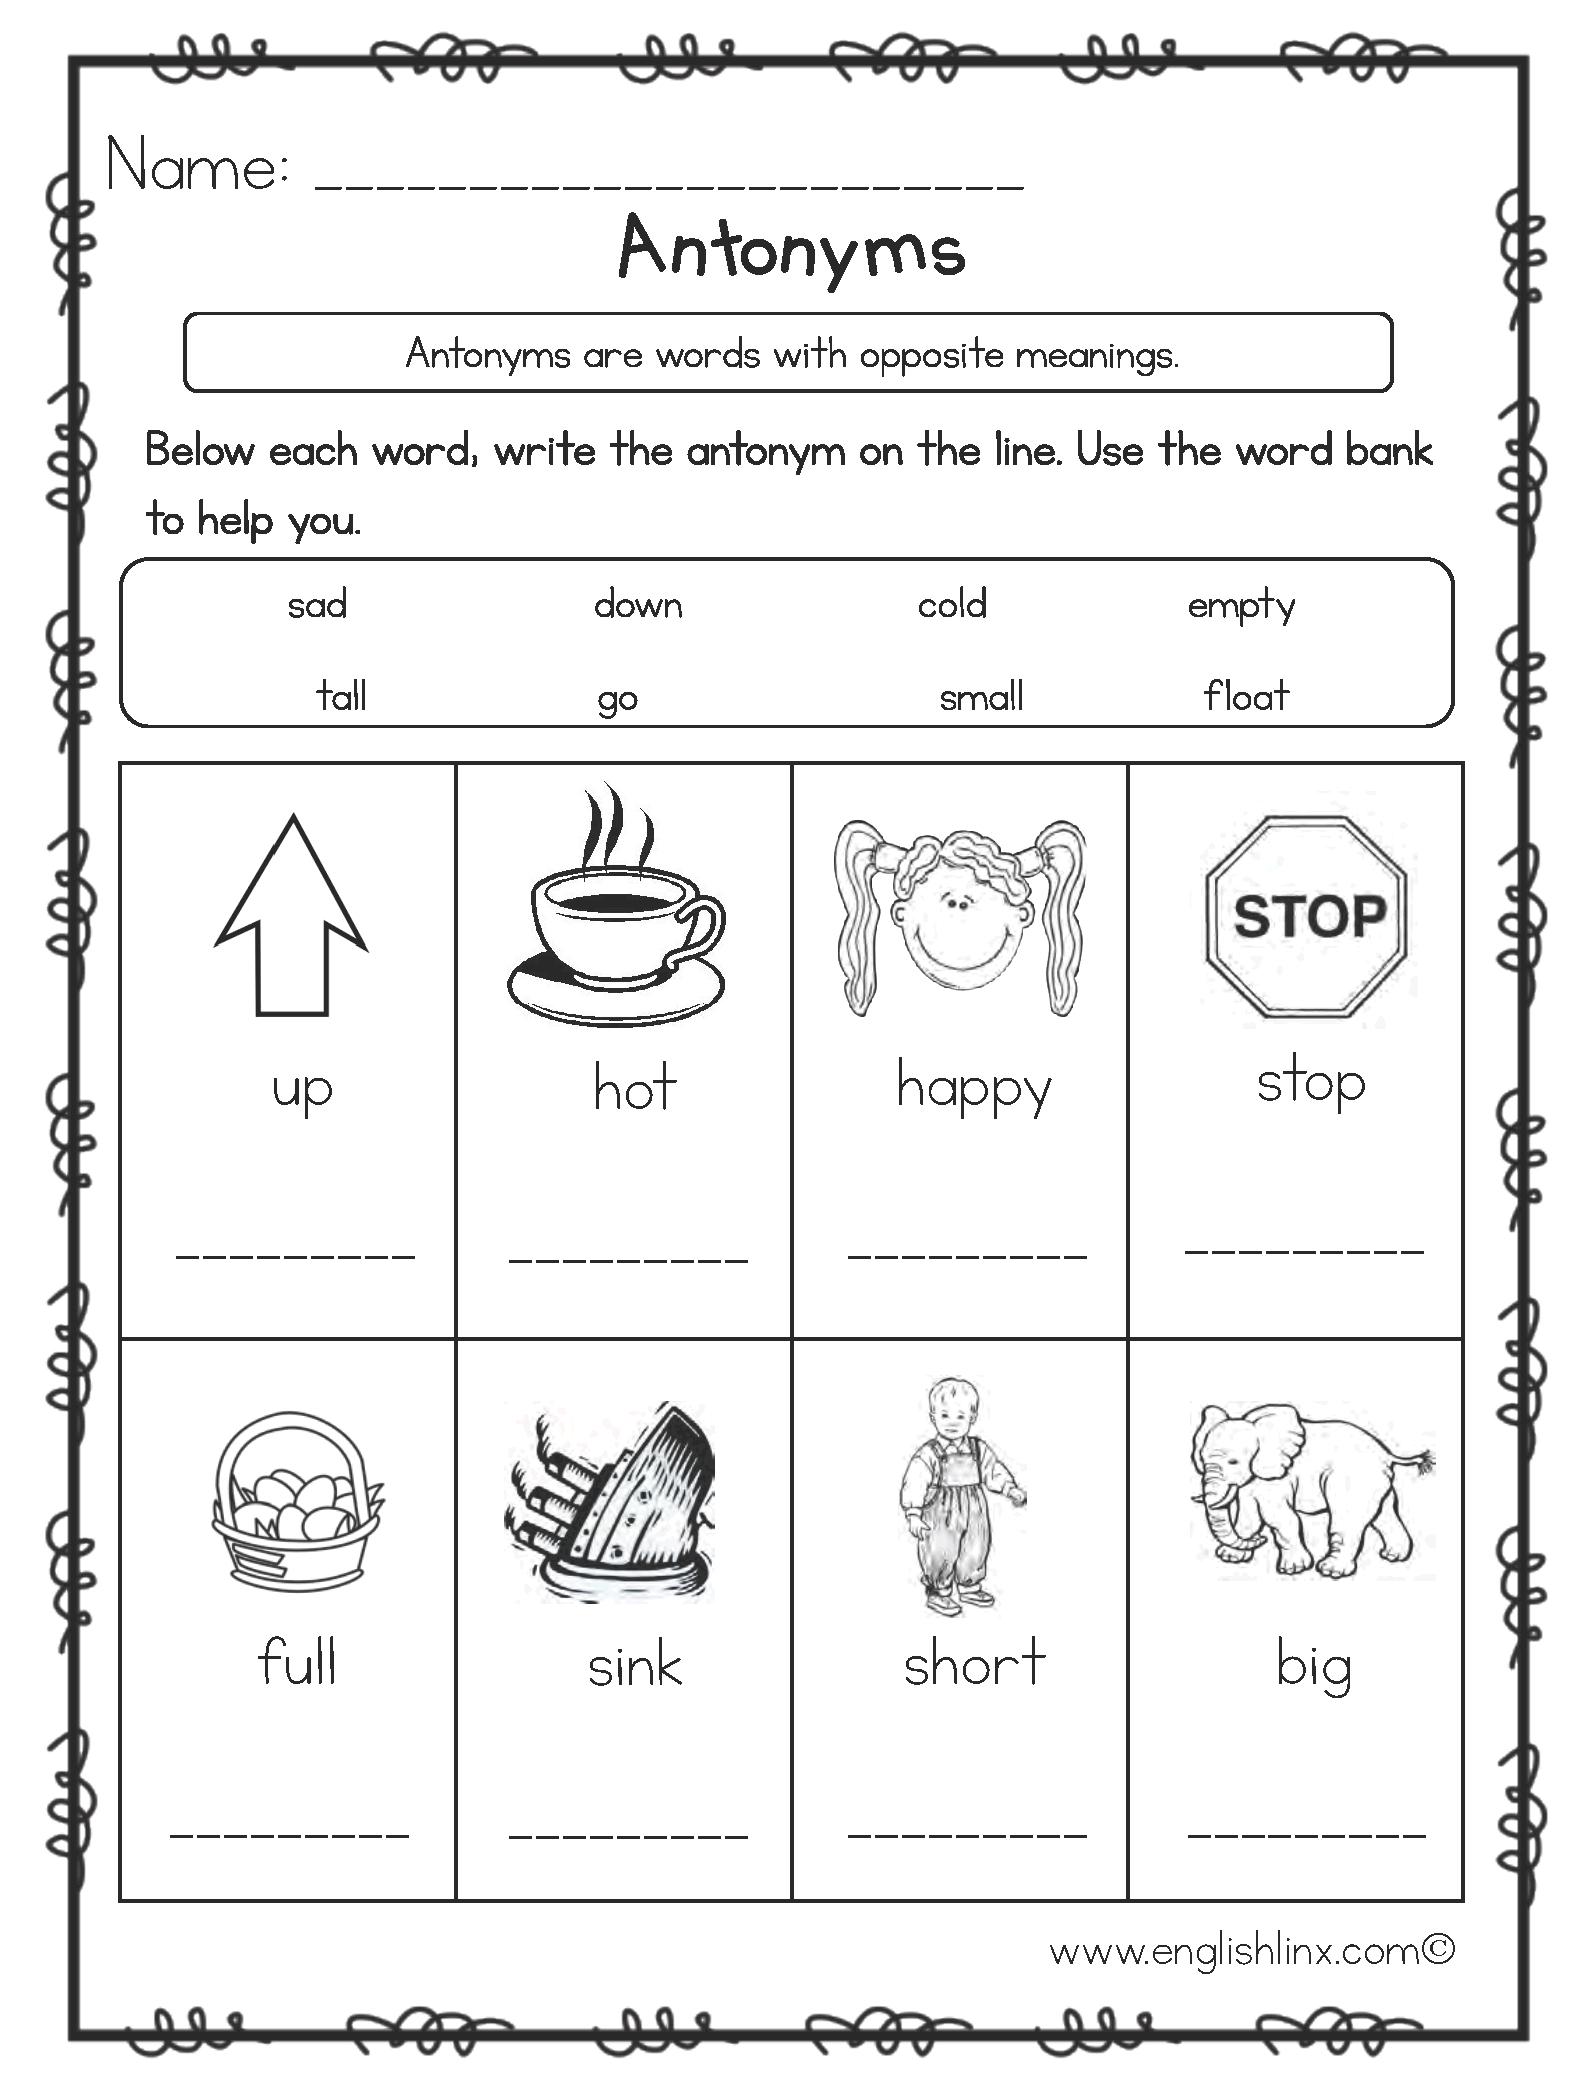 Englishlinx | Antonyms Worksheets | Antonyms Printable Worksheets